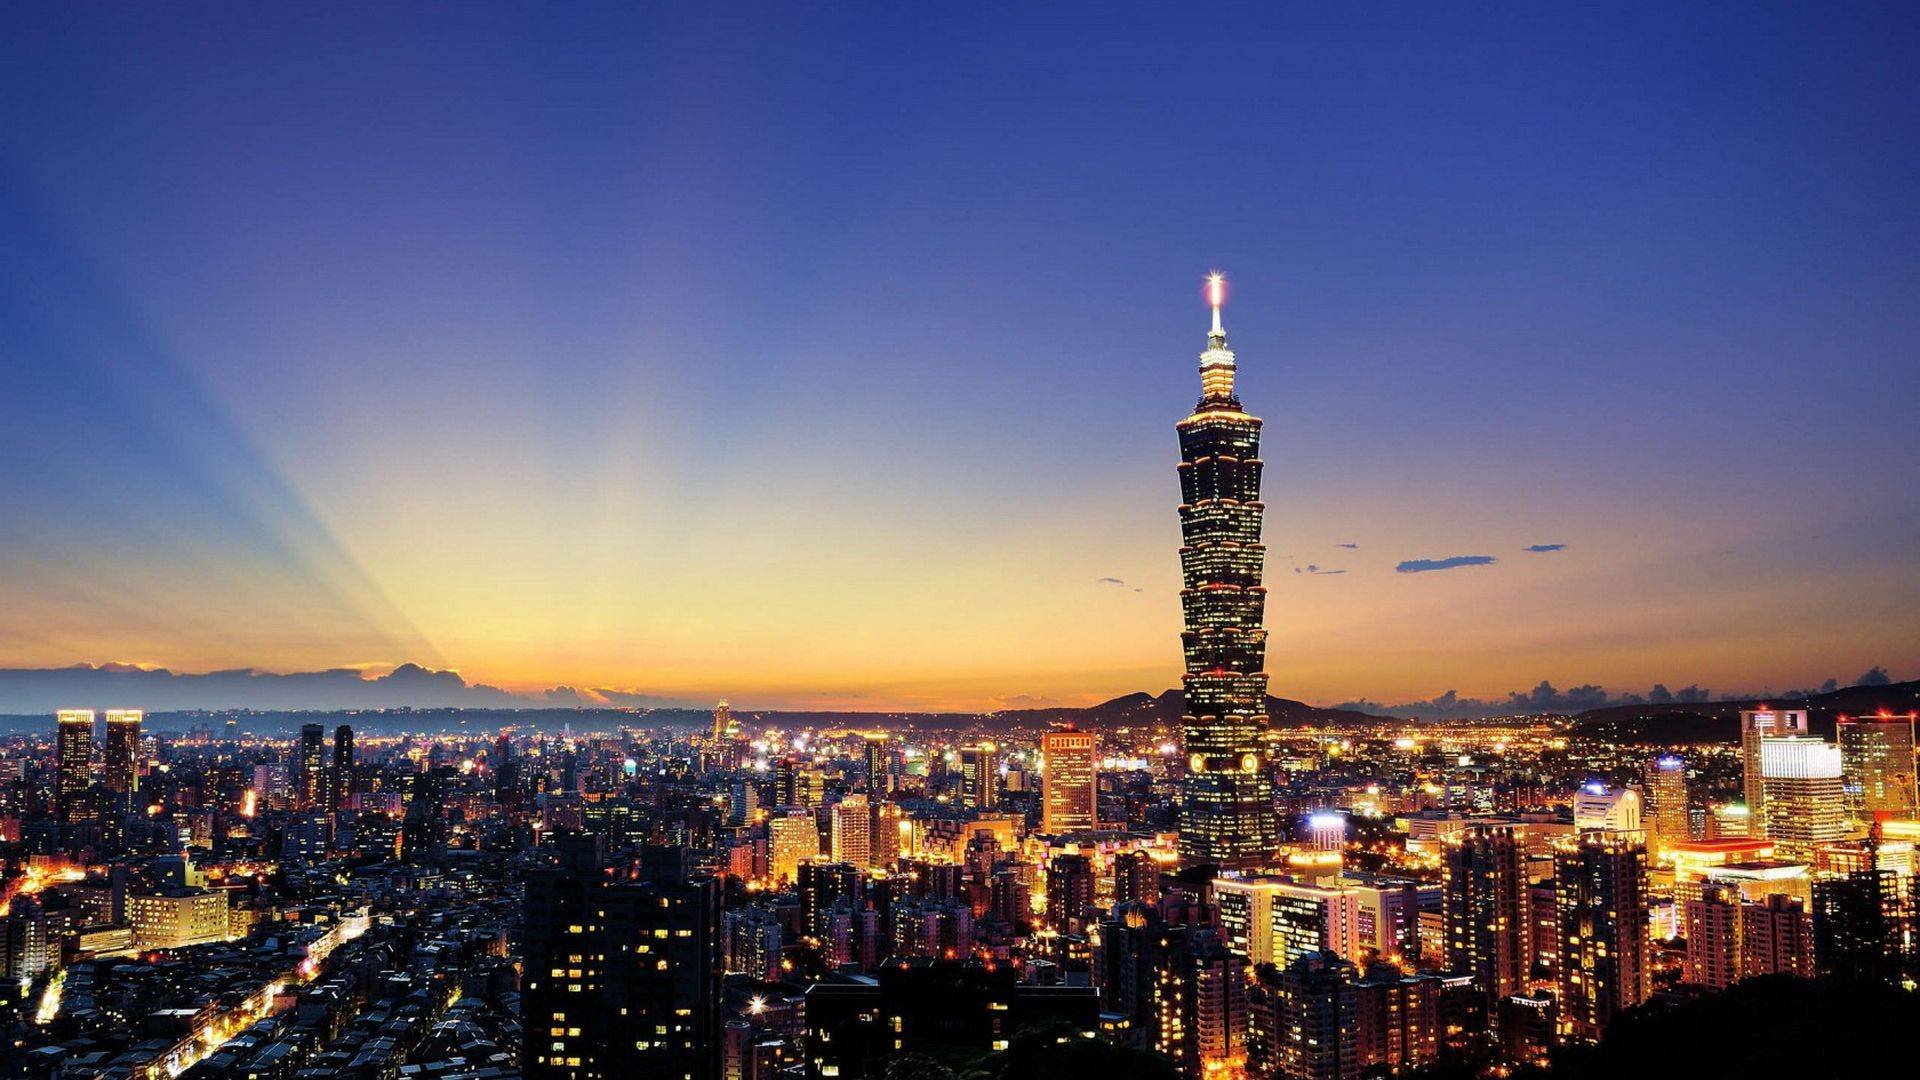 gdp增长7_青岛承诺:今年引才24万人以上GDP增长7%左右